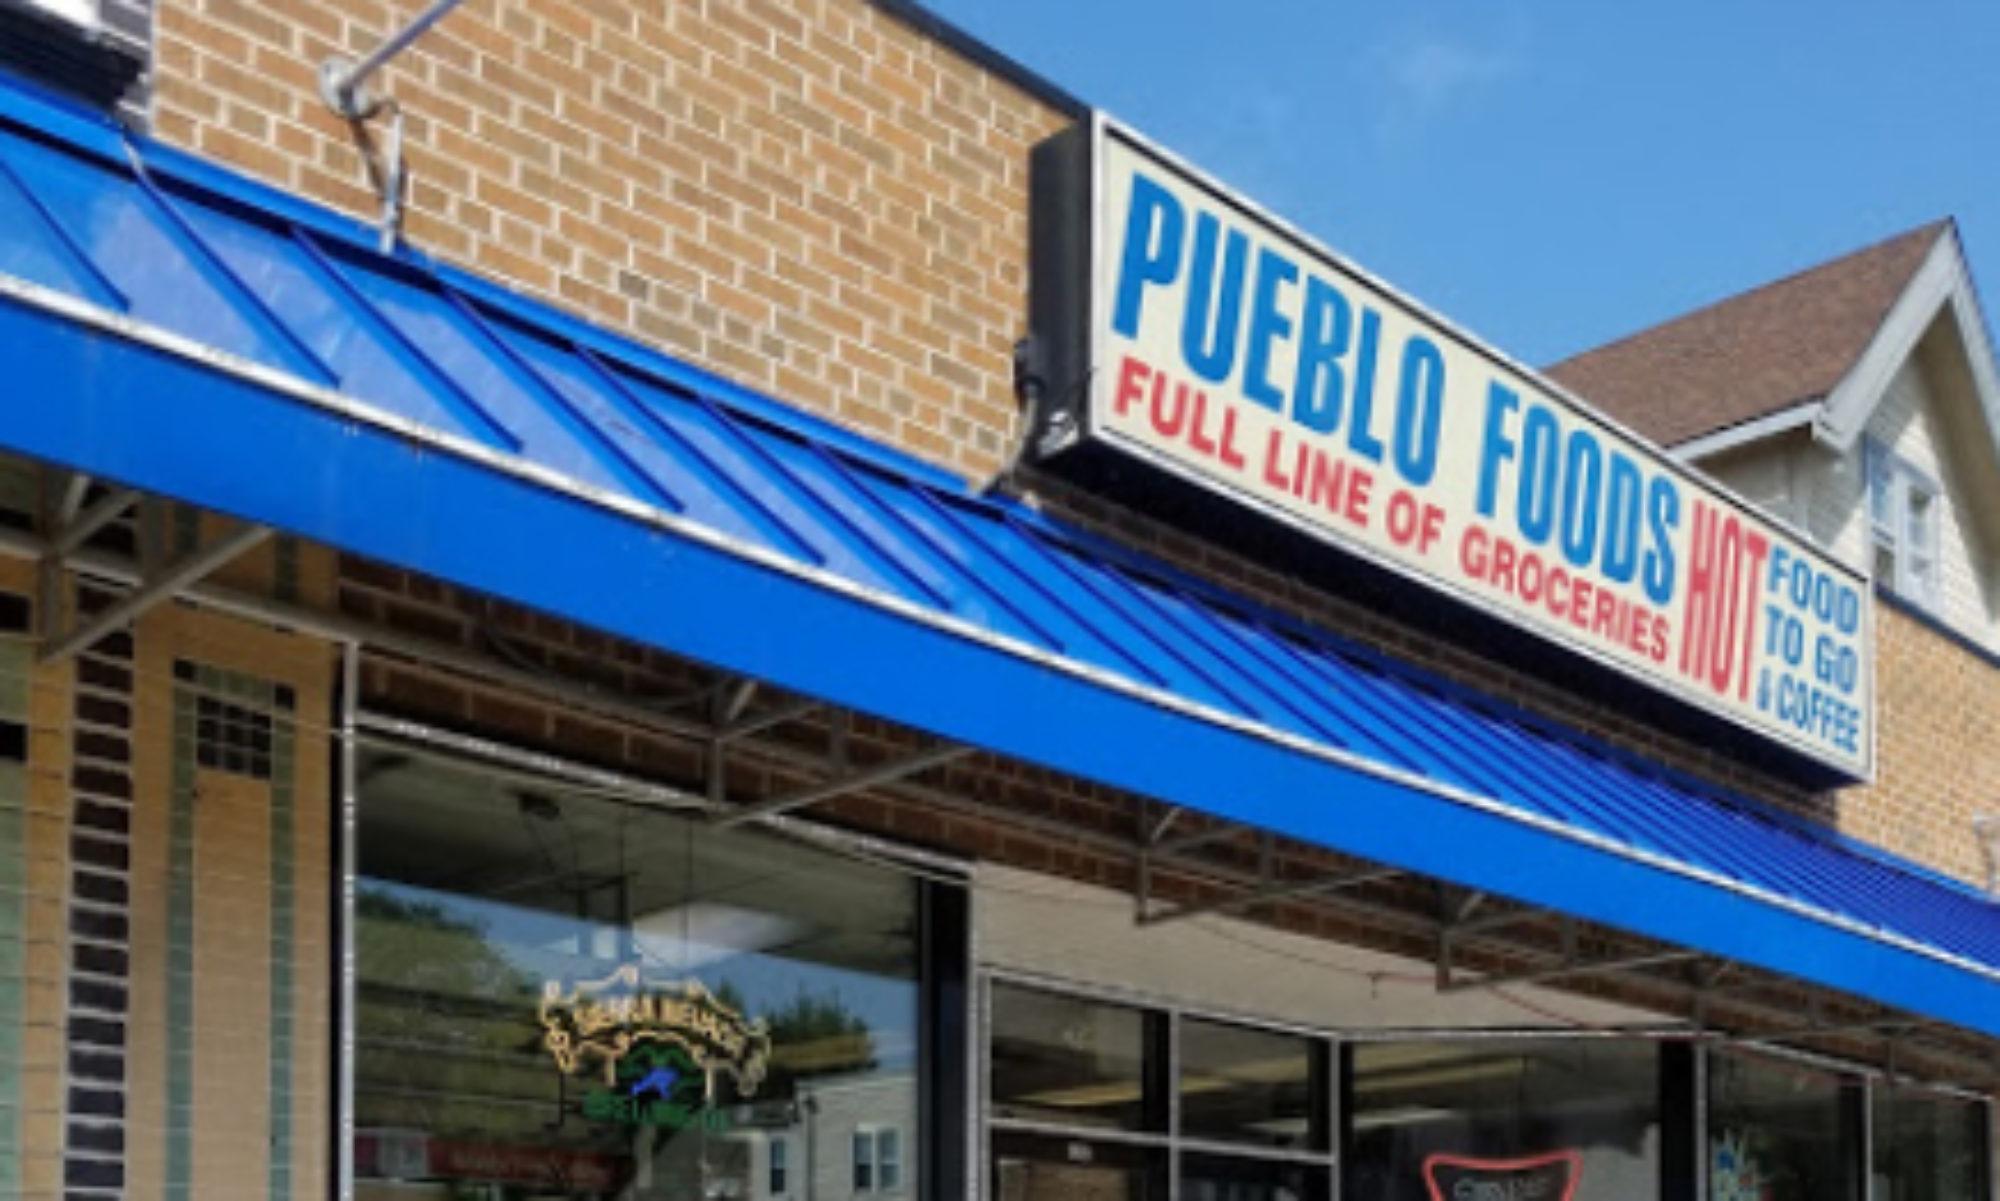 Pueblo foods & liquor